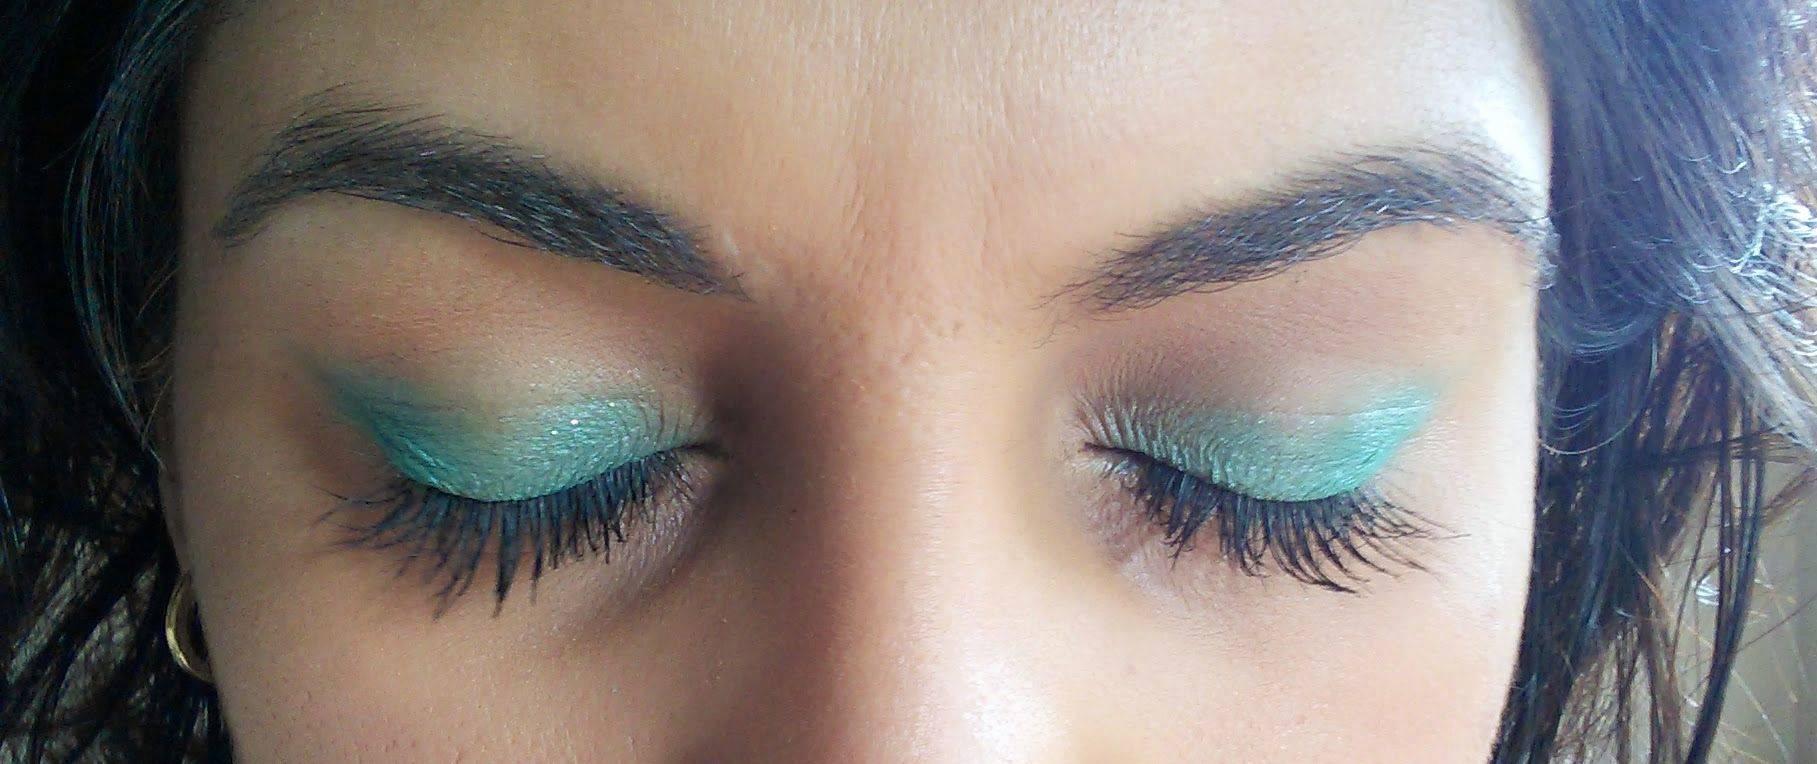 spring eyes - mac's aquadisiac shadow and dior's diorshow blackout